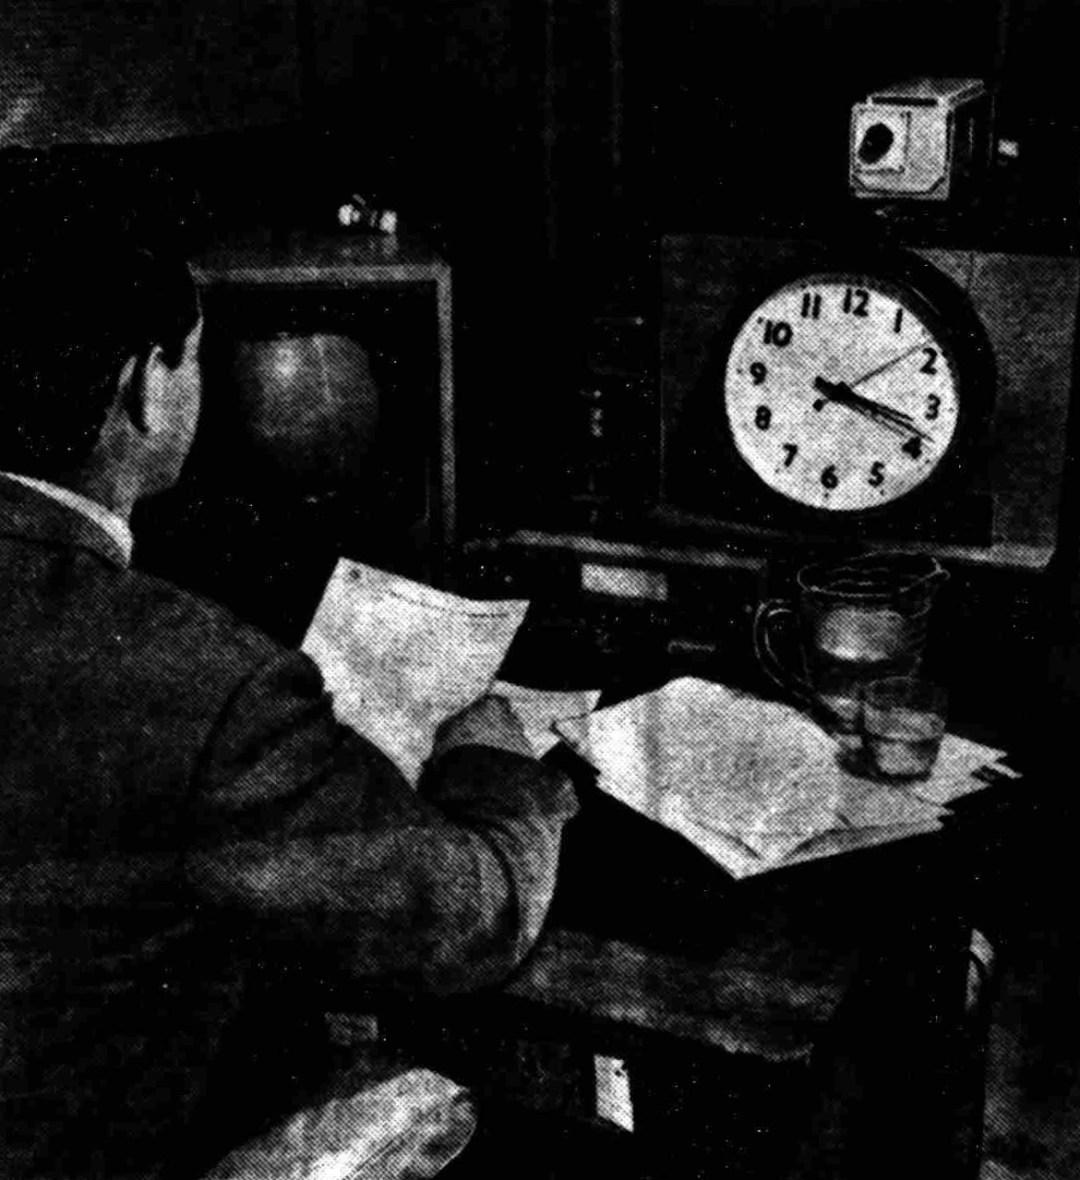 John Edmunds' view from the announcer's desk